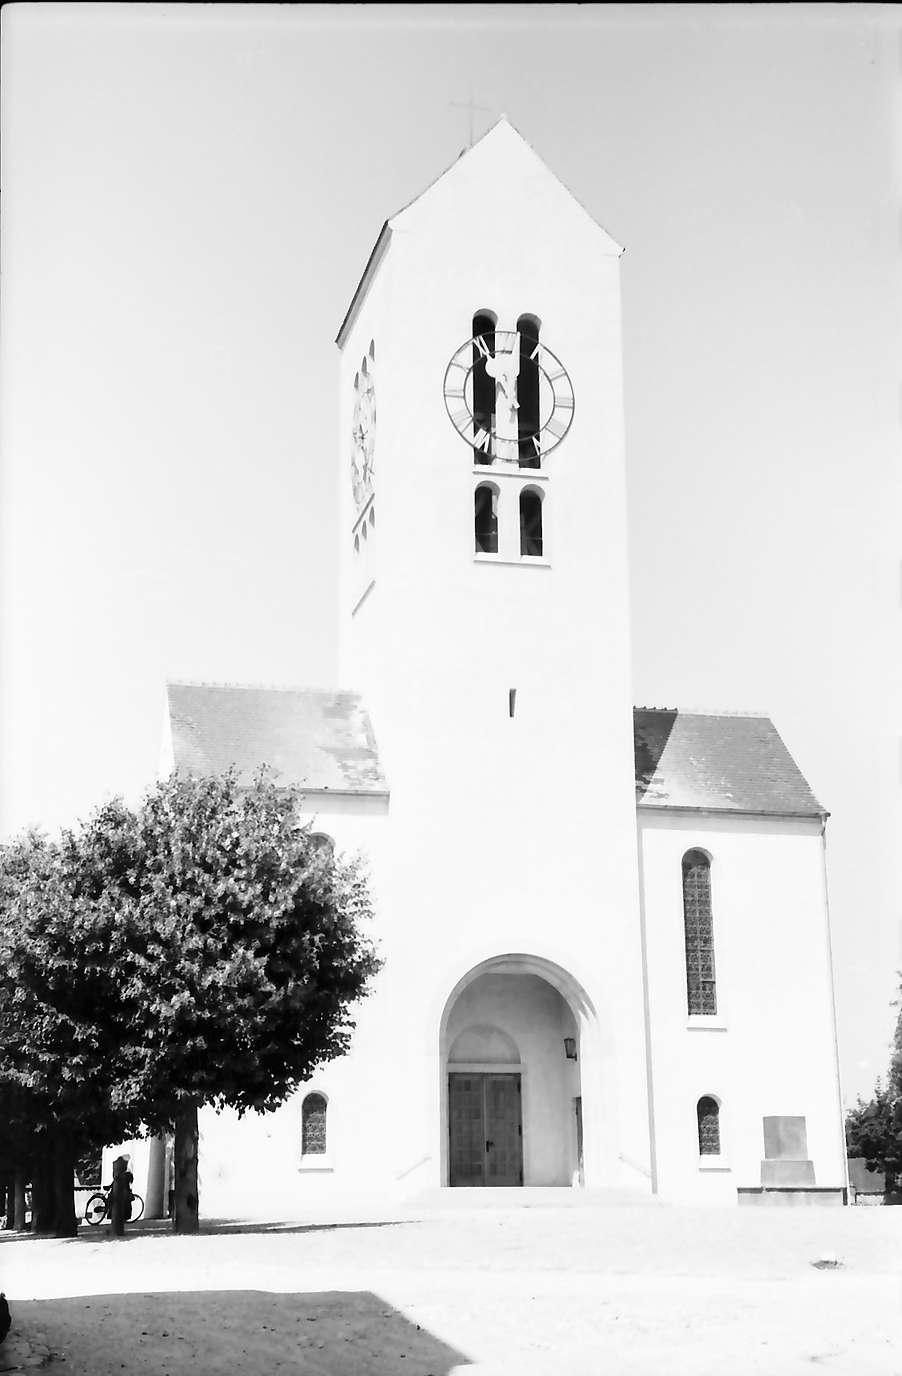 Neuenburg: Kirche, Frontalansicht mit Turm, Bild 1